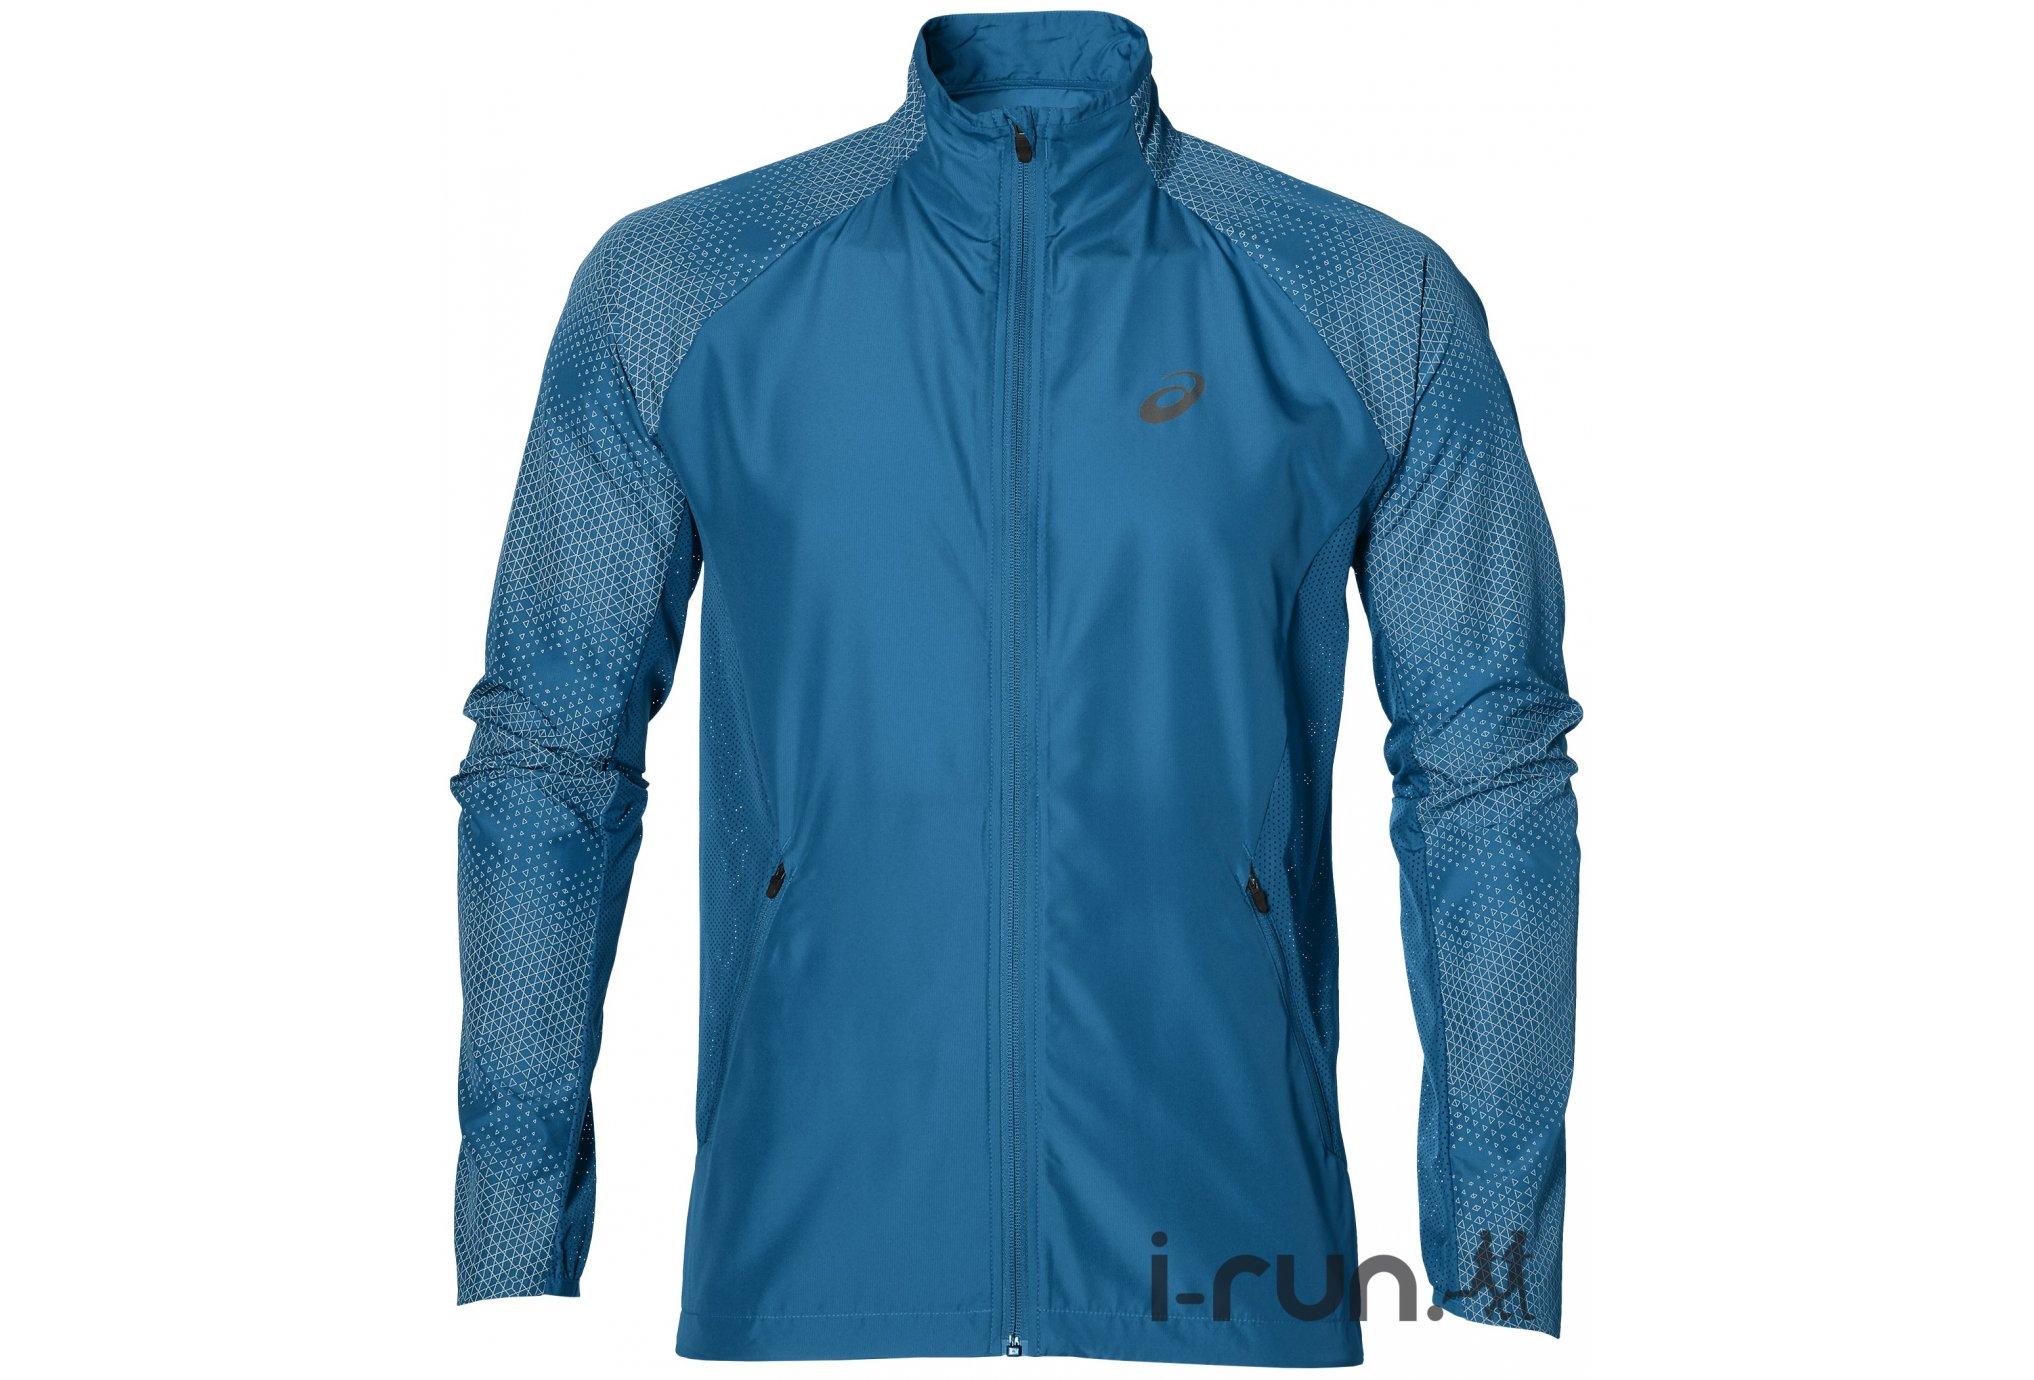 Asics Lite-Show Jacket M vêtement running homme